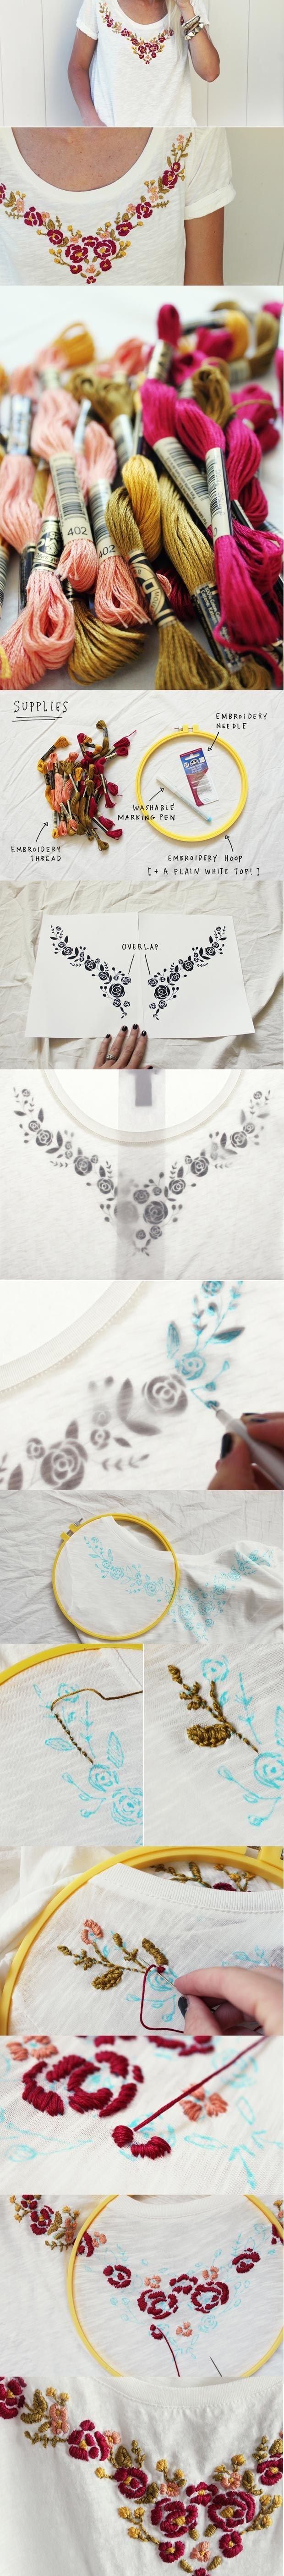 DIY: Hand Embroidered T-shirt - inspiring picture on Joyzz.com